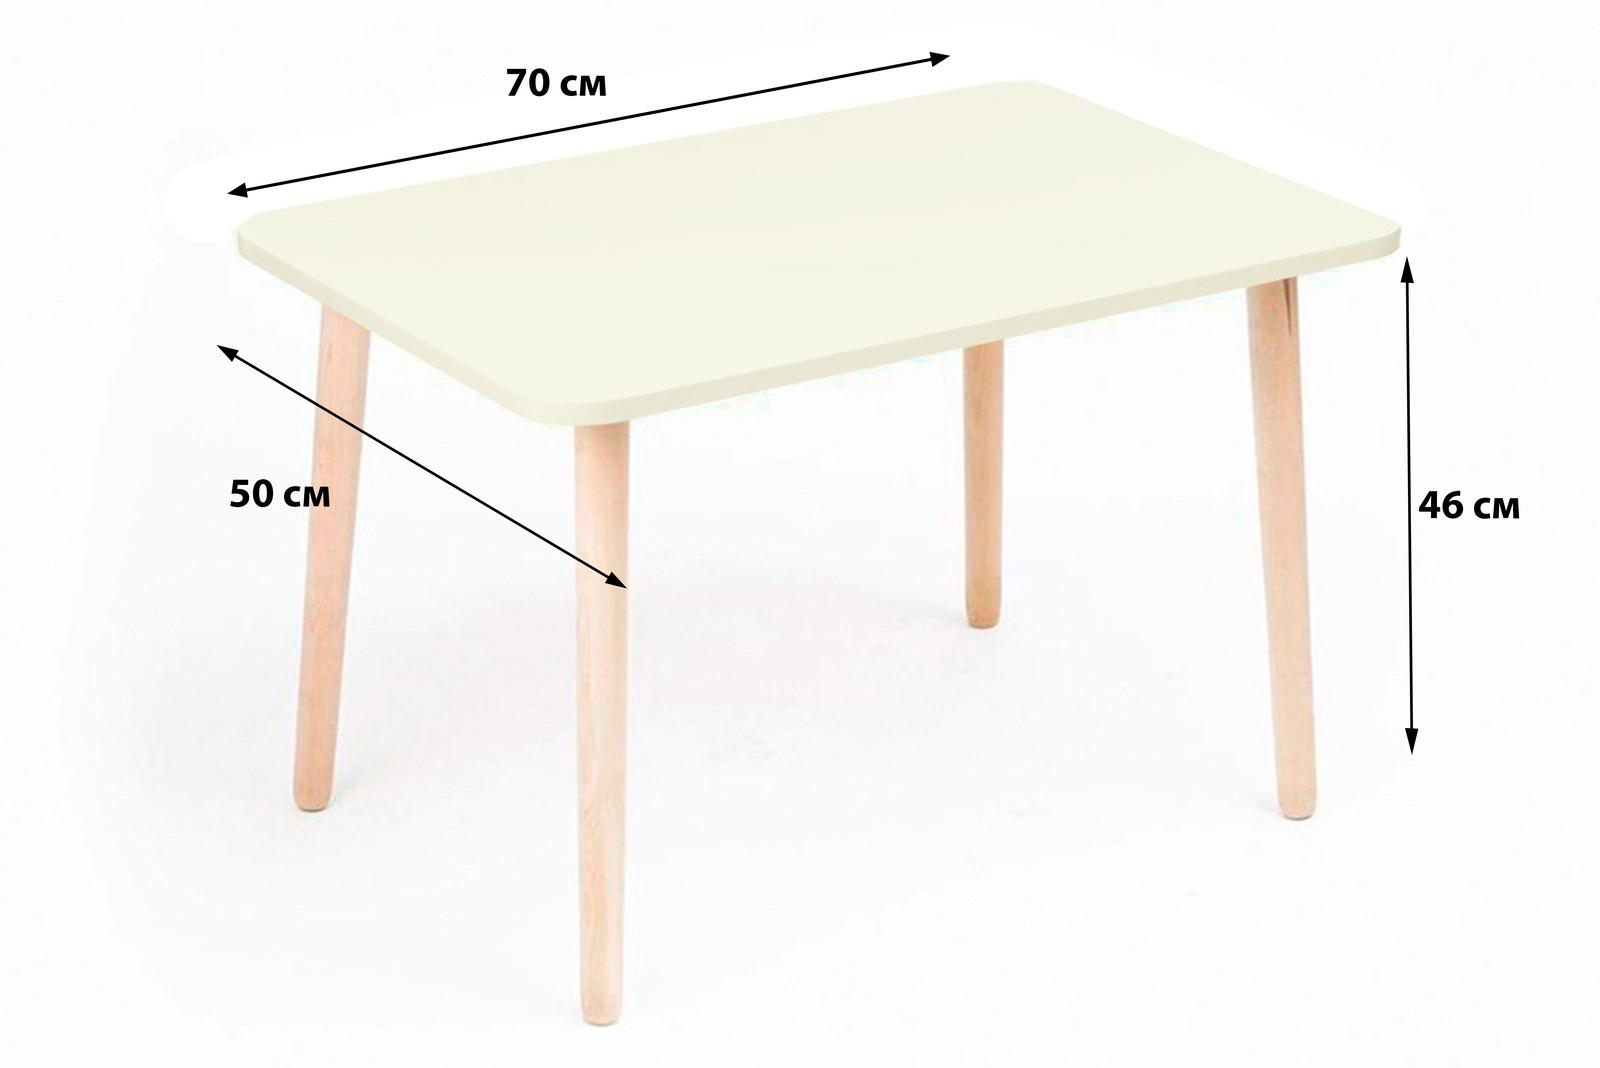 Детский стол Polli Tolli Джери, 33676, светло-бежевый стол polli tolli джери оранжевое солнце